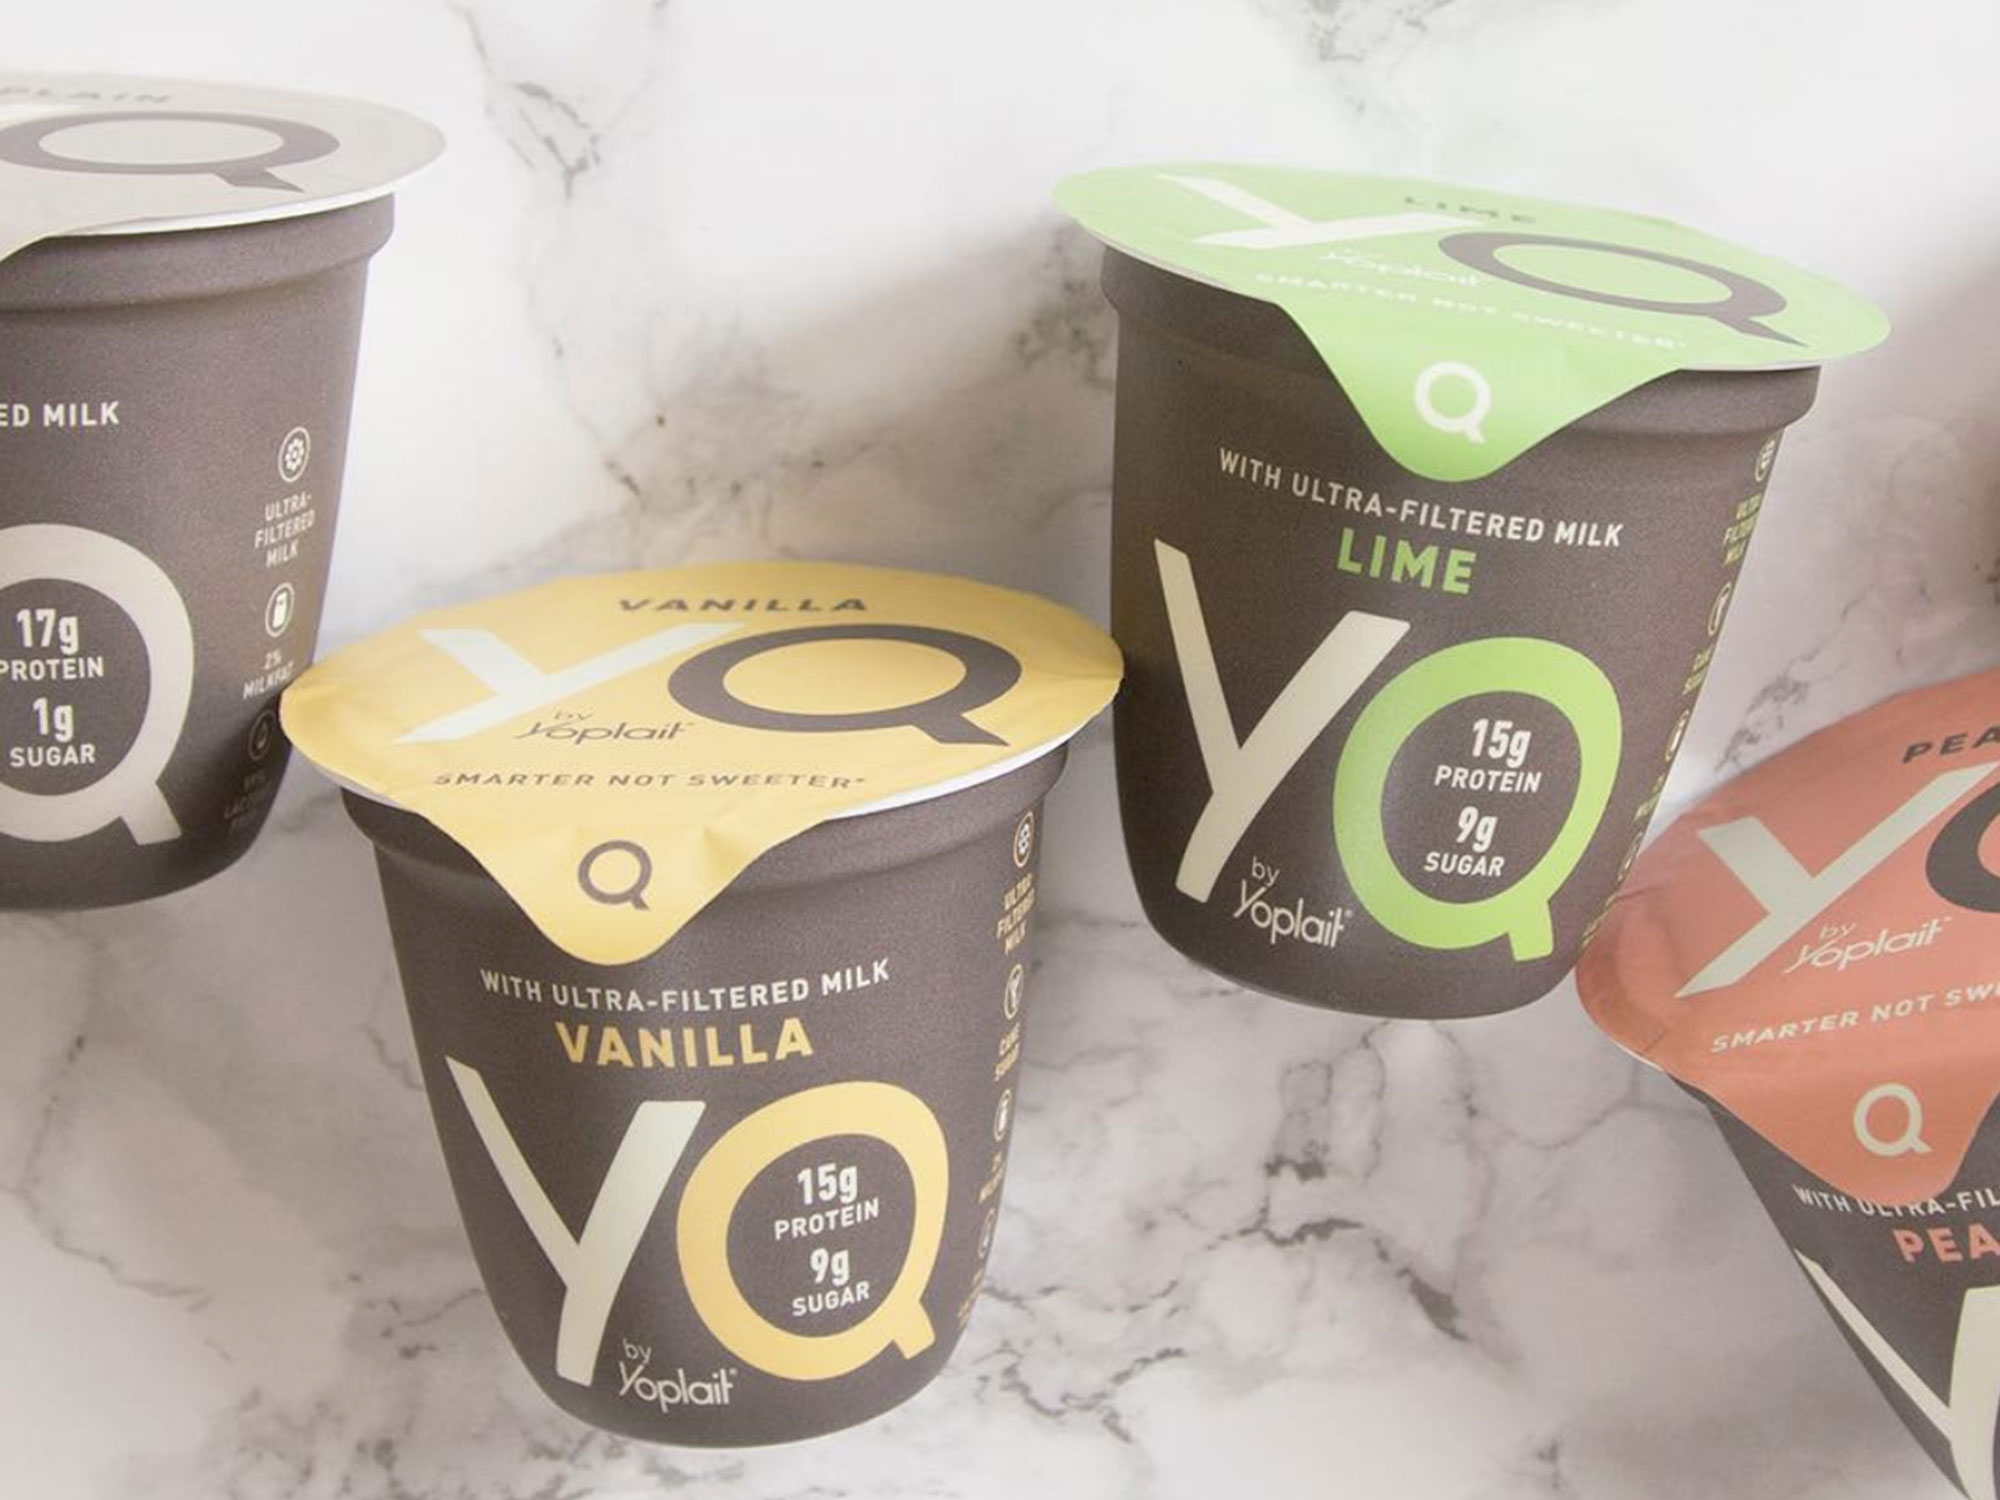 yq-yoplait-yogurt.jpg